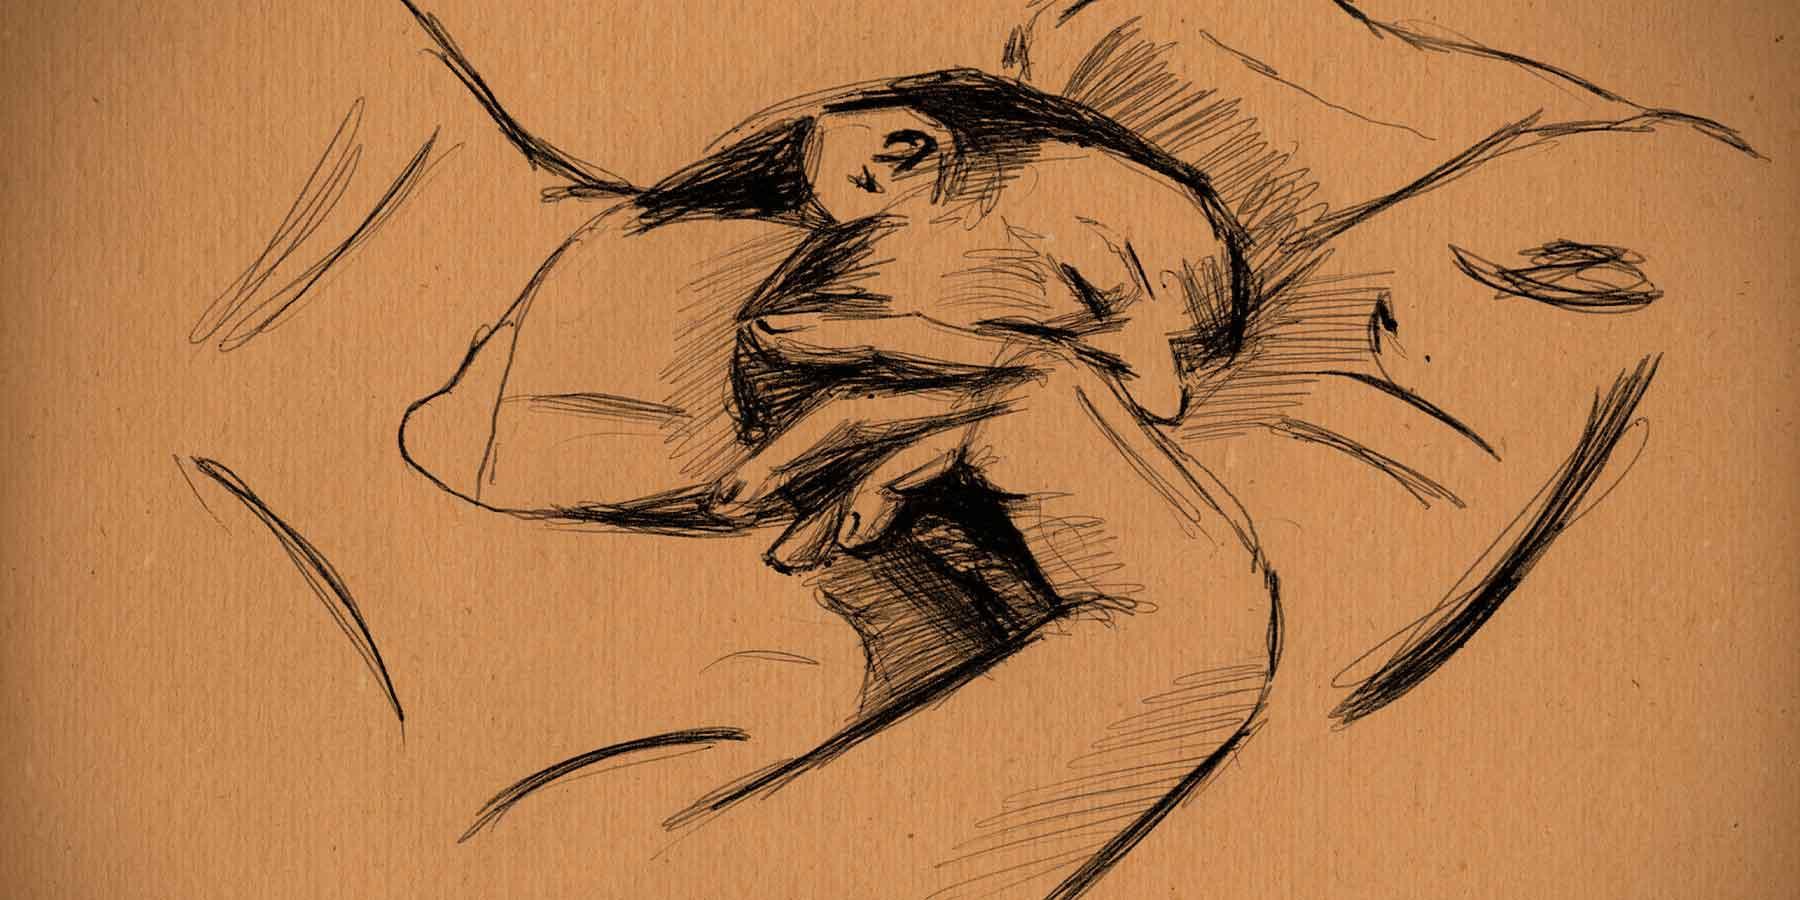 mind is happy in sleep